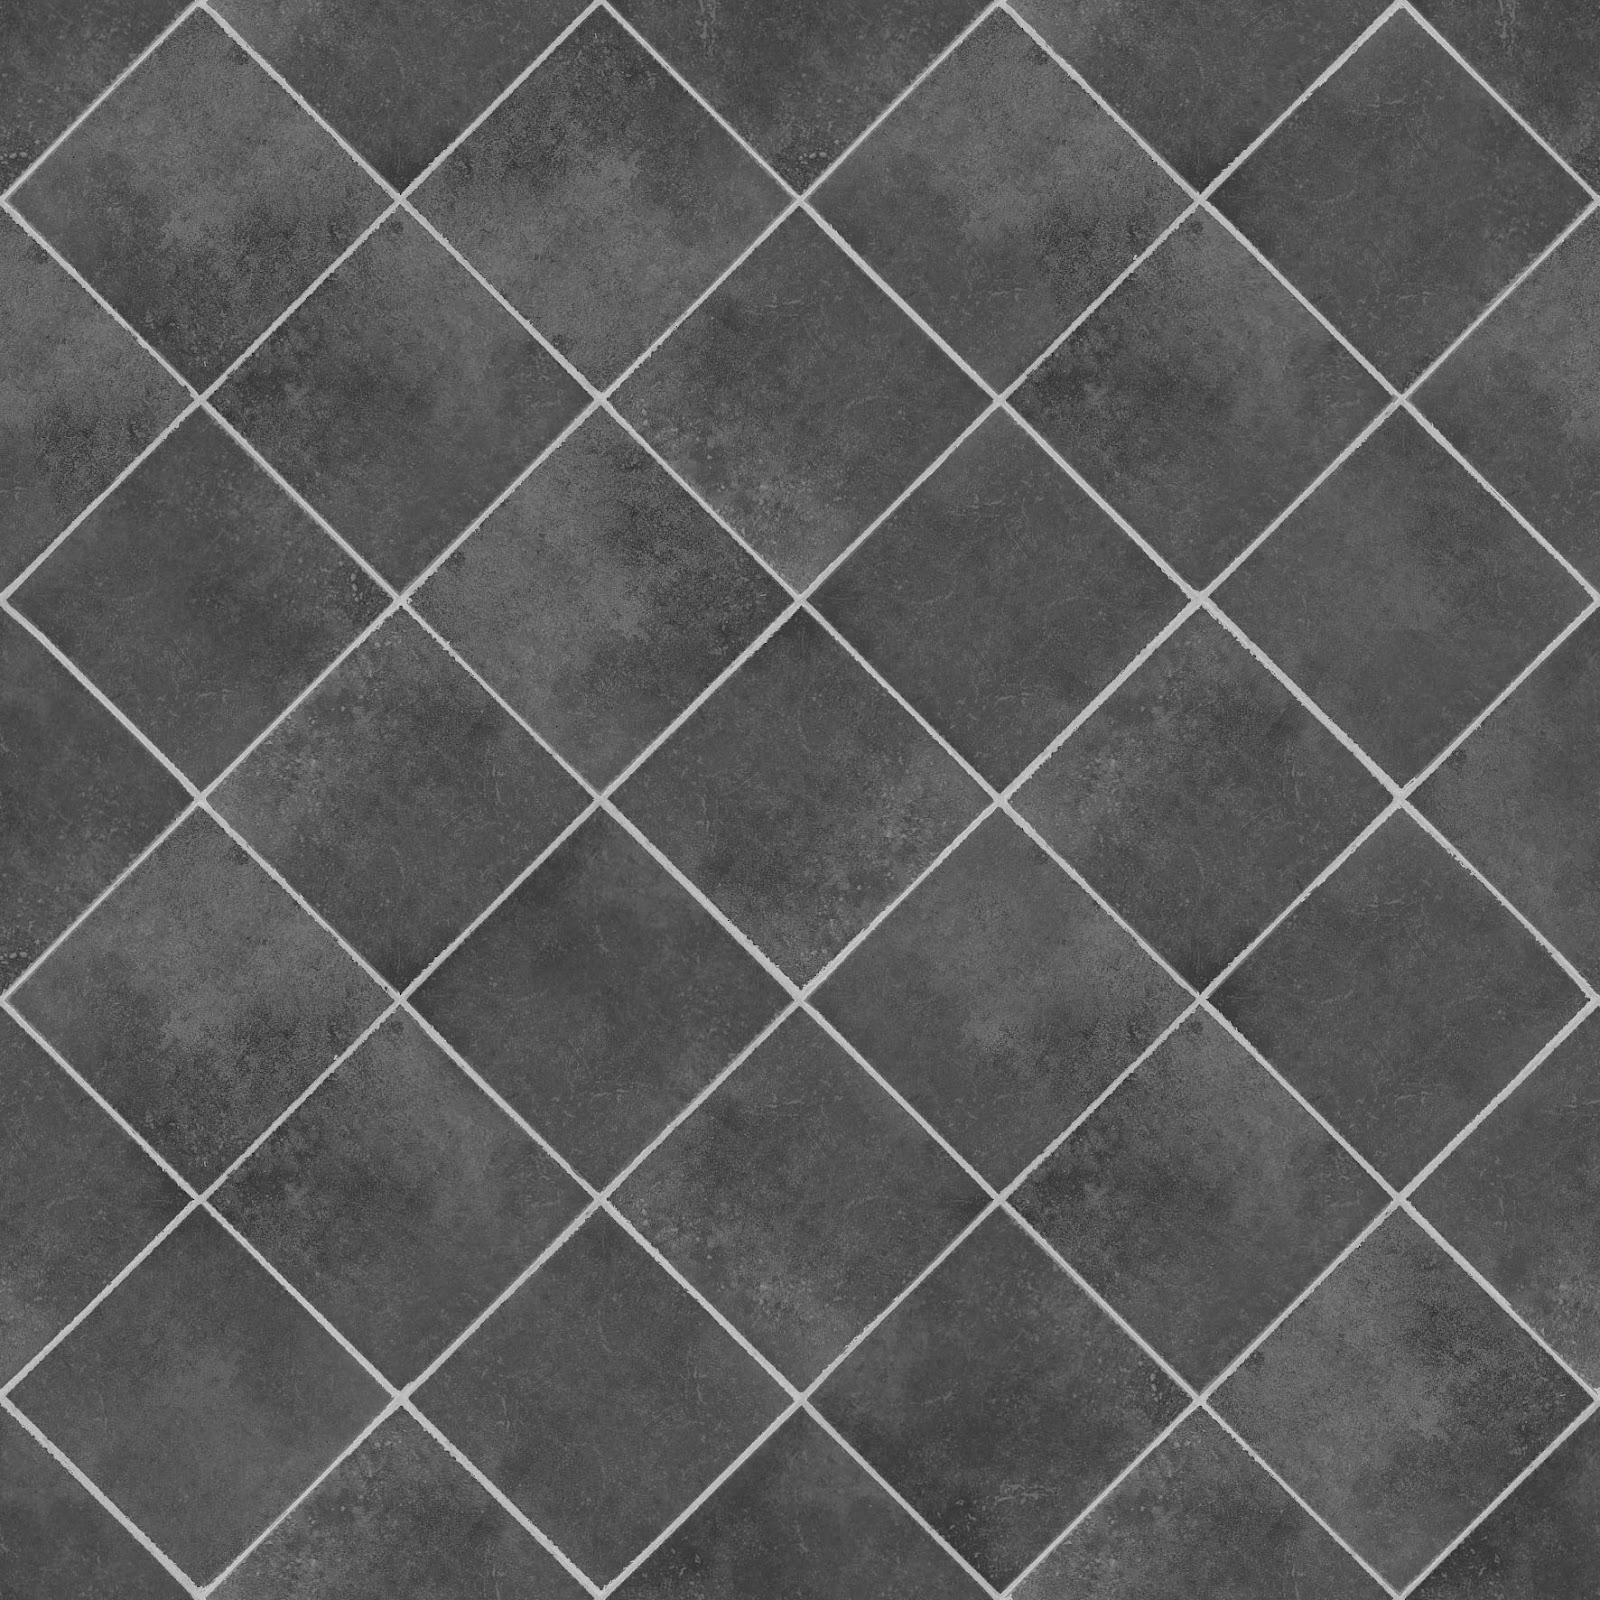 Modern bathroom tile texture interior design seamless kitchen flooring ideasidea dailygadgetfo Choice Image